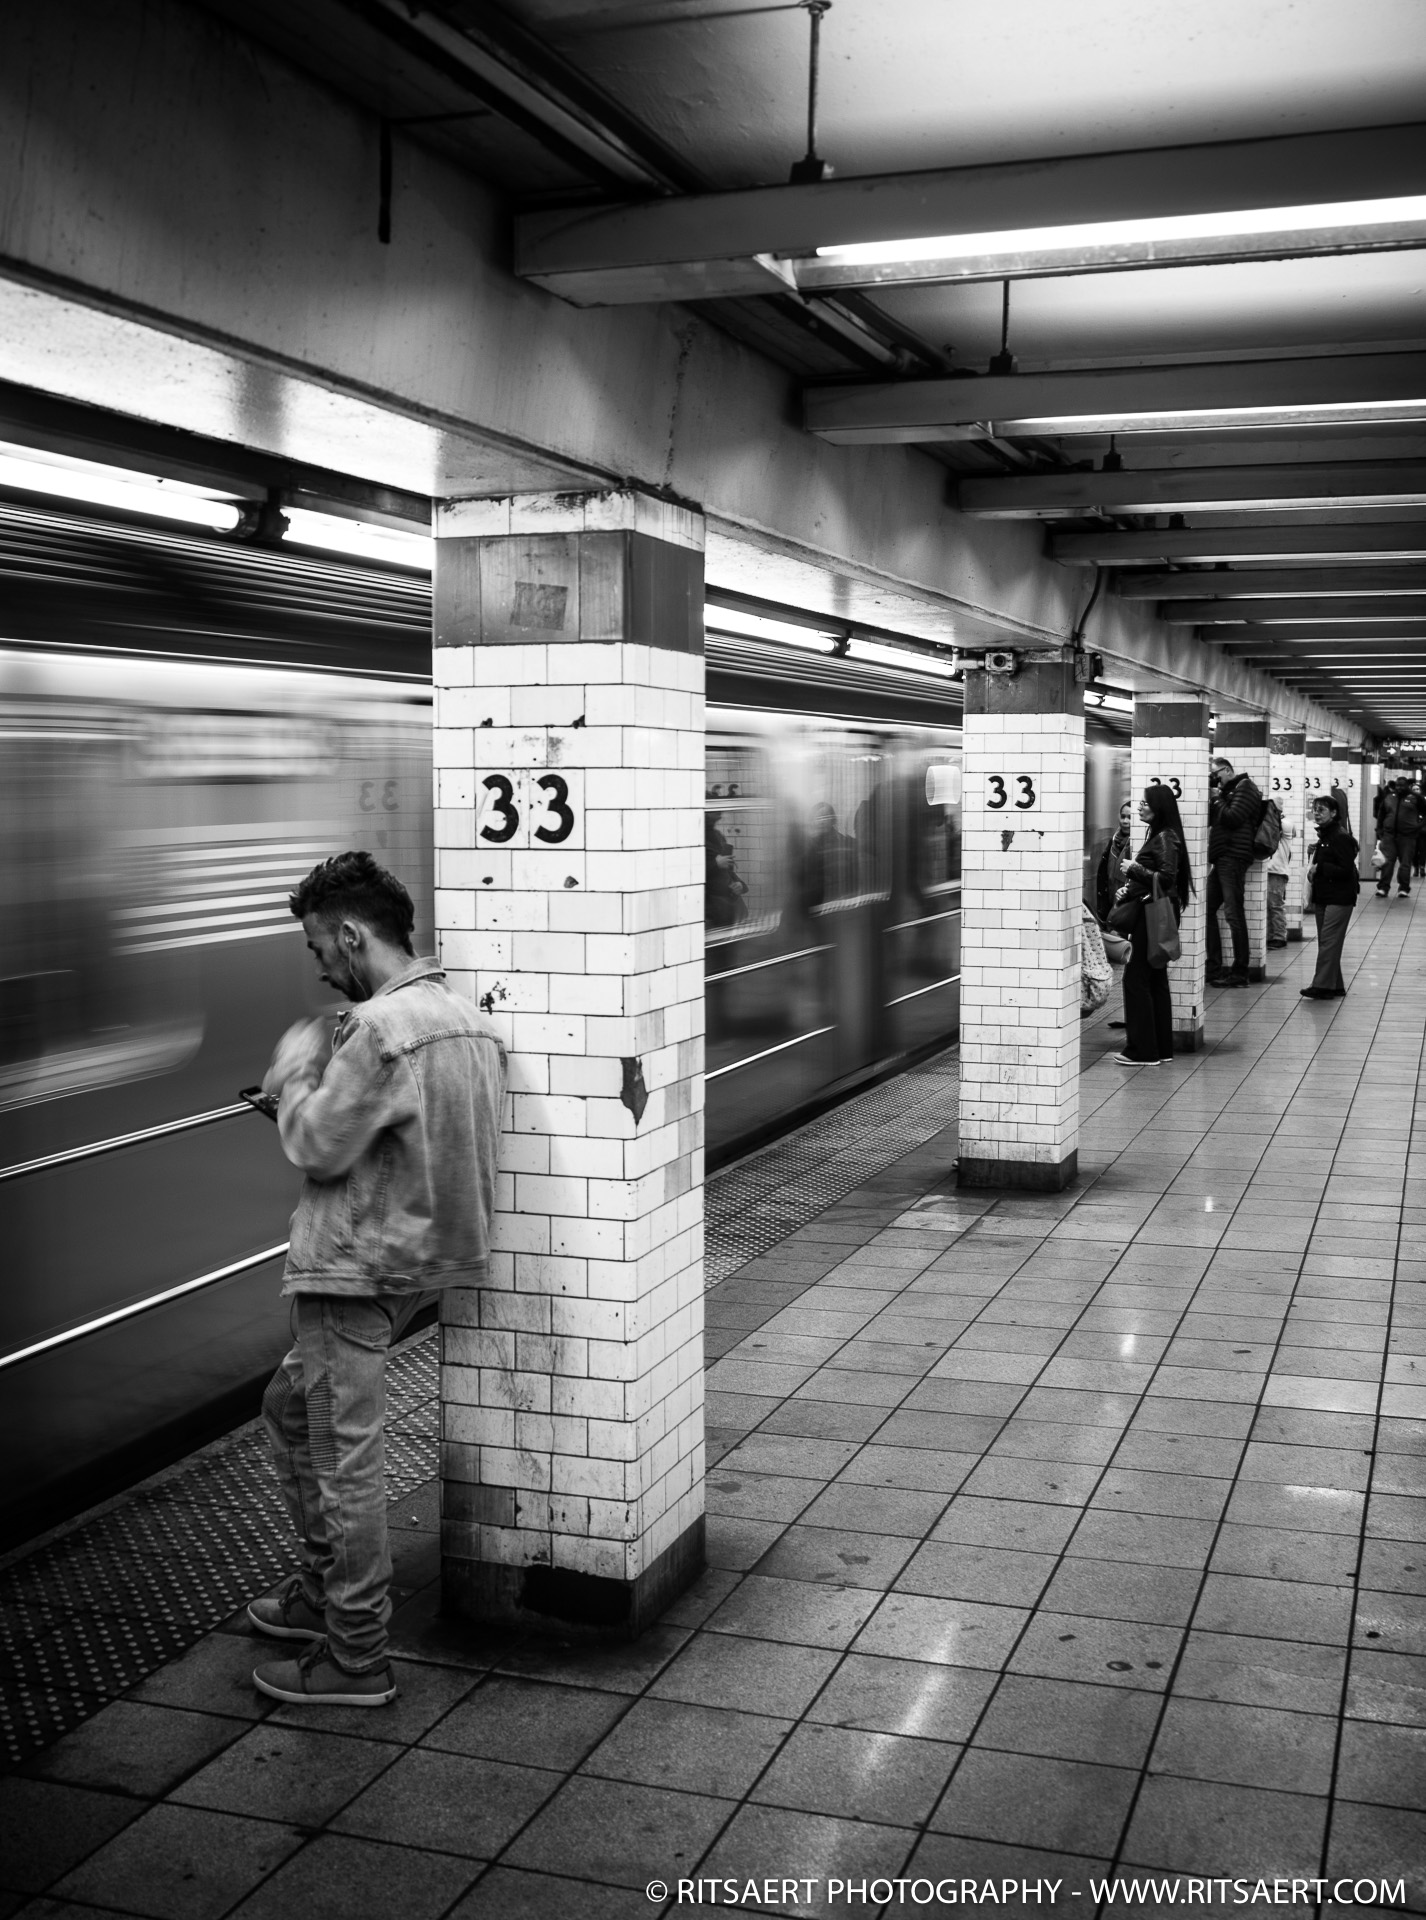 Subway - New York - USA